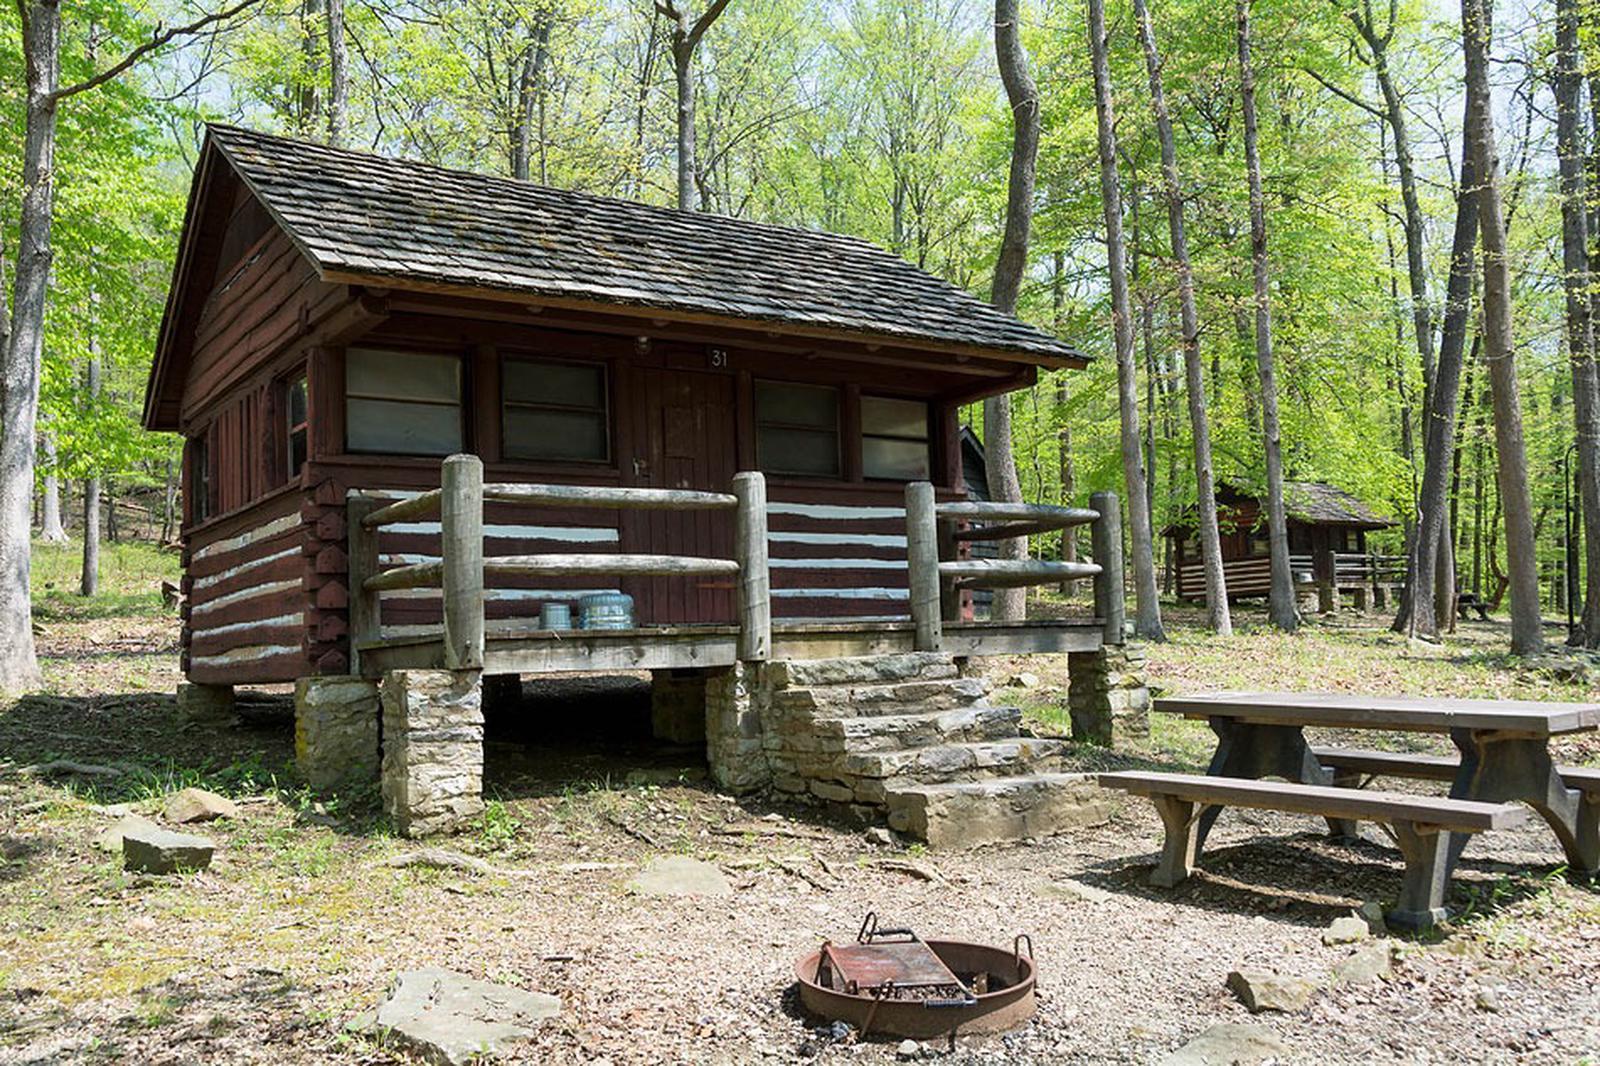 Camp Misty Mount Cabin 31